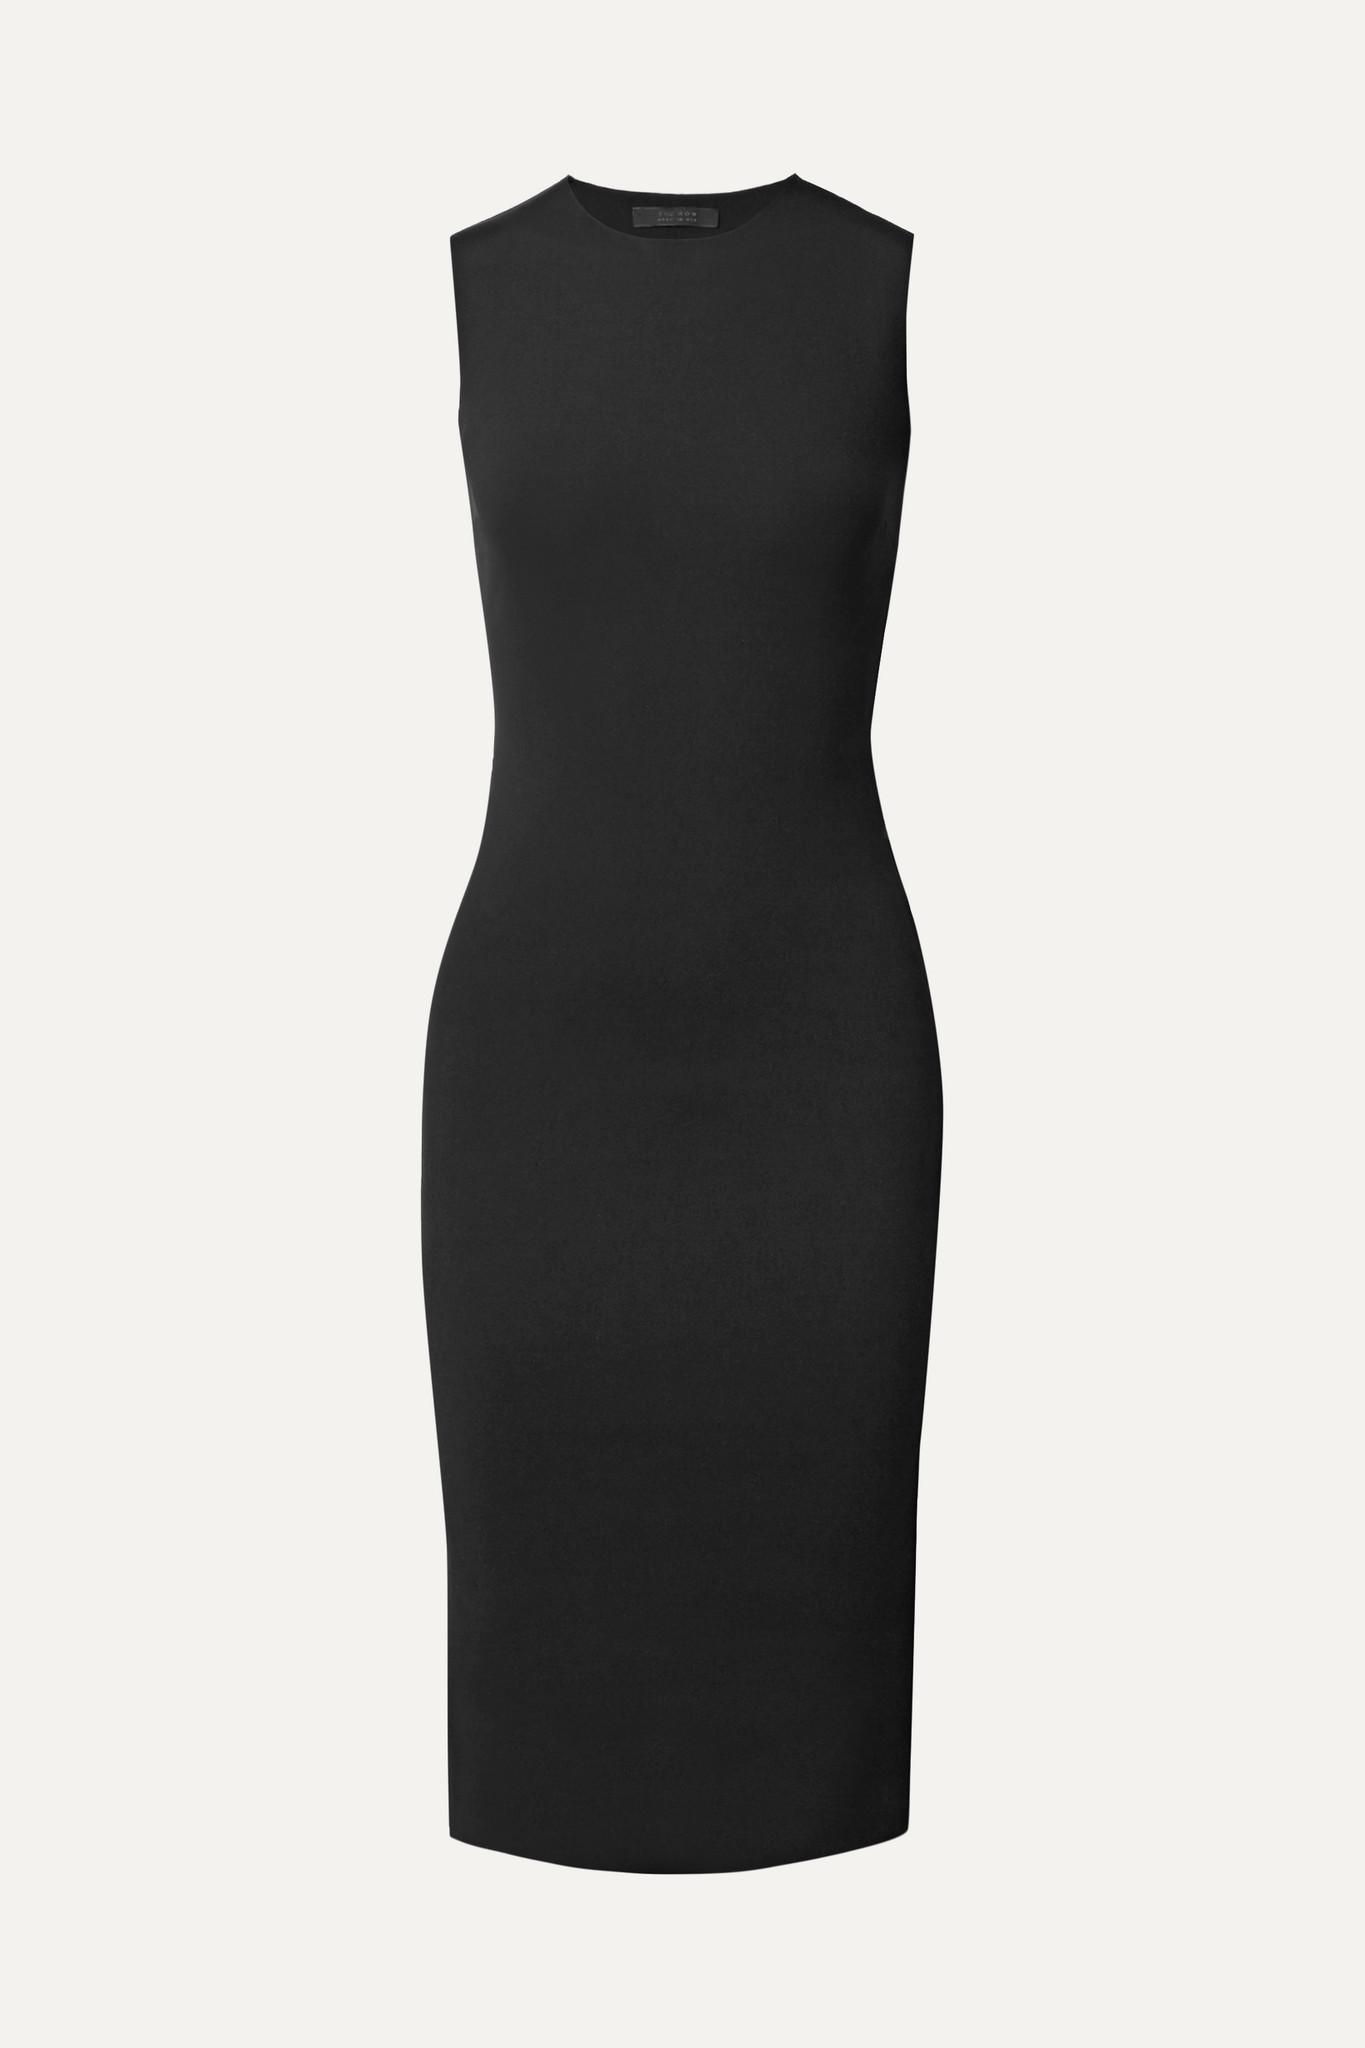 THE ROW - Devi 弹力潜水服面料连衣裙 - 黑色 - large